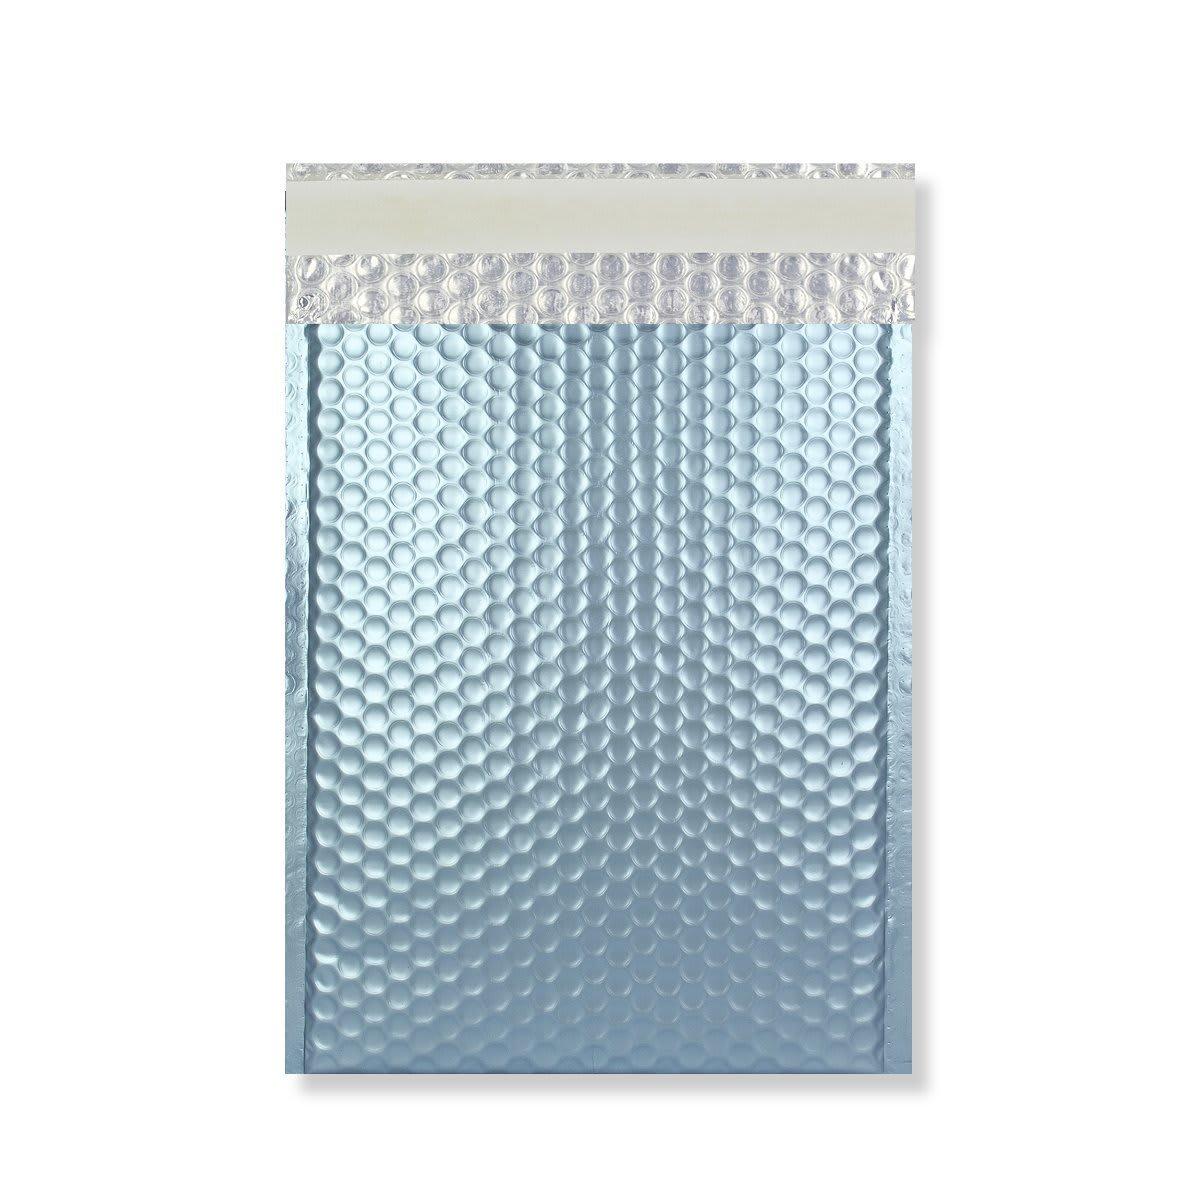 C4 MATT METALLIC ICE BLUE PADDED ENVELOPES (324 x 230MM)